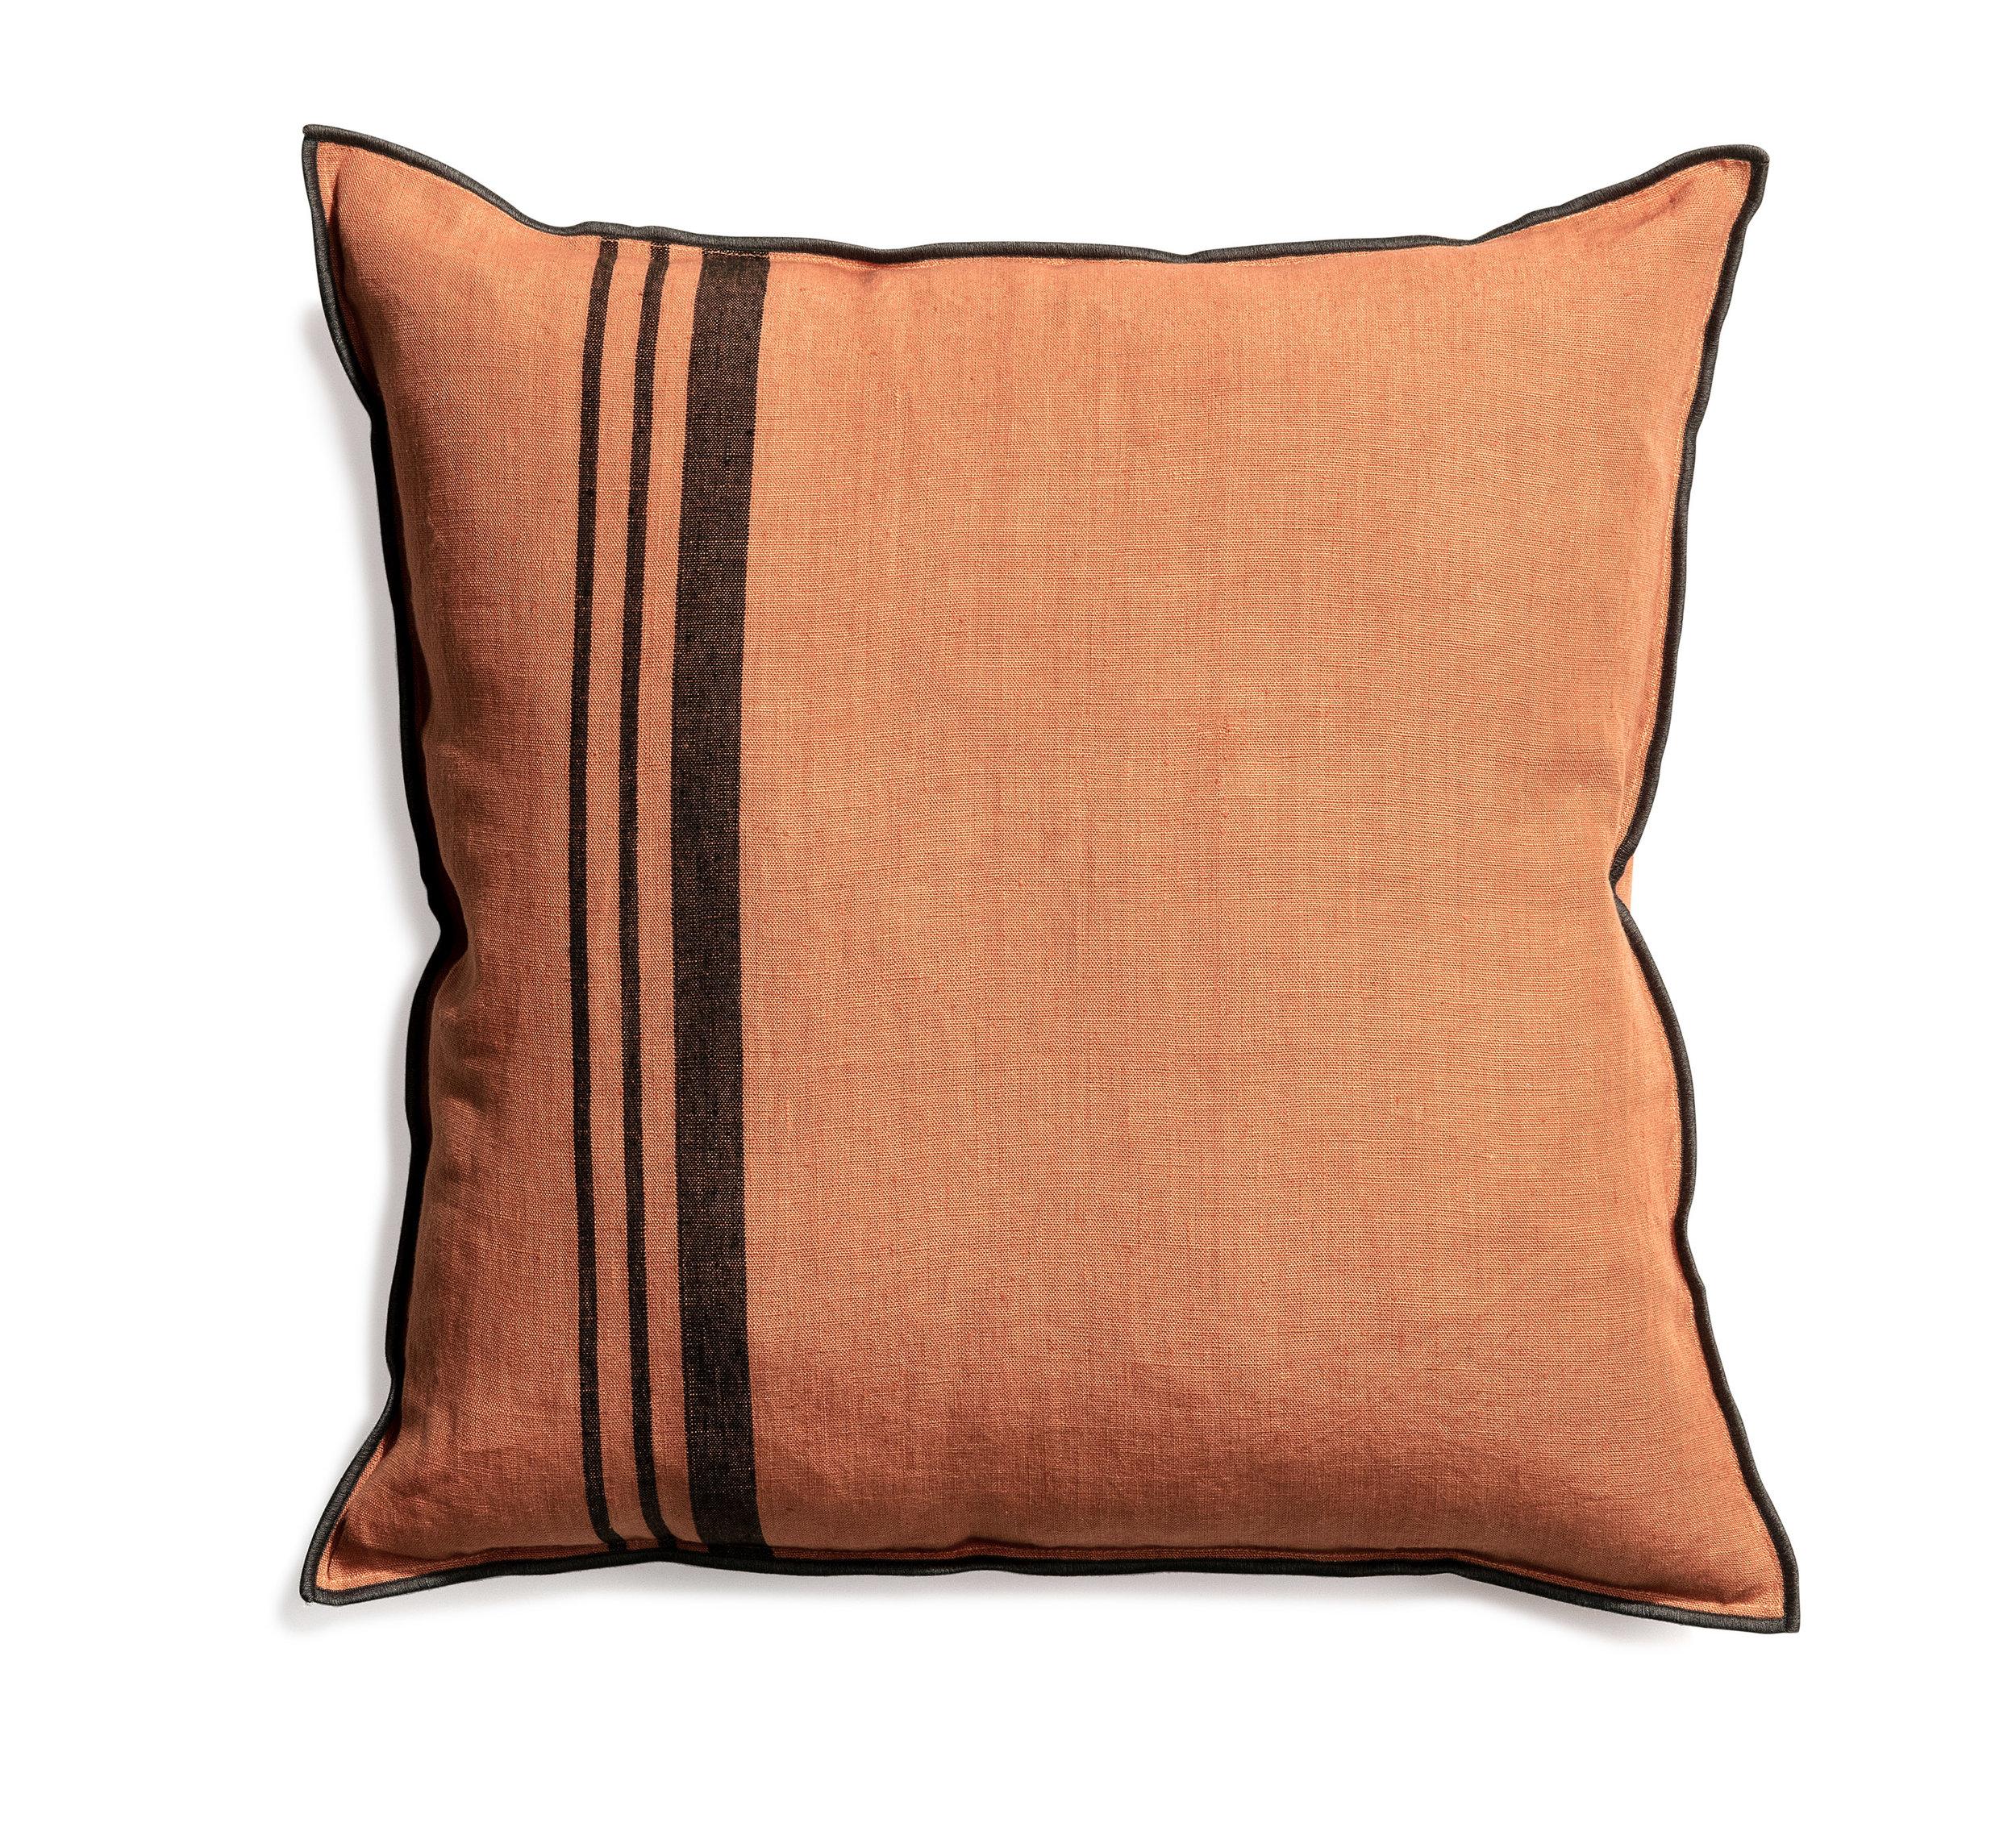 Loft cushion stripe dry_terracotta 50x50